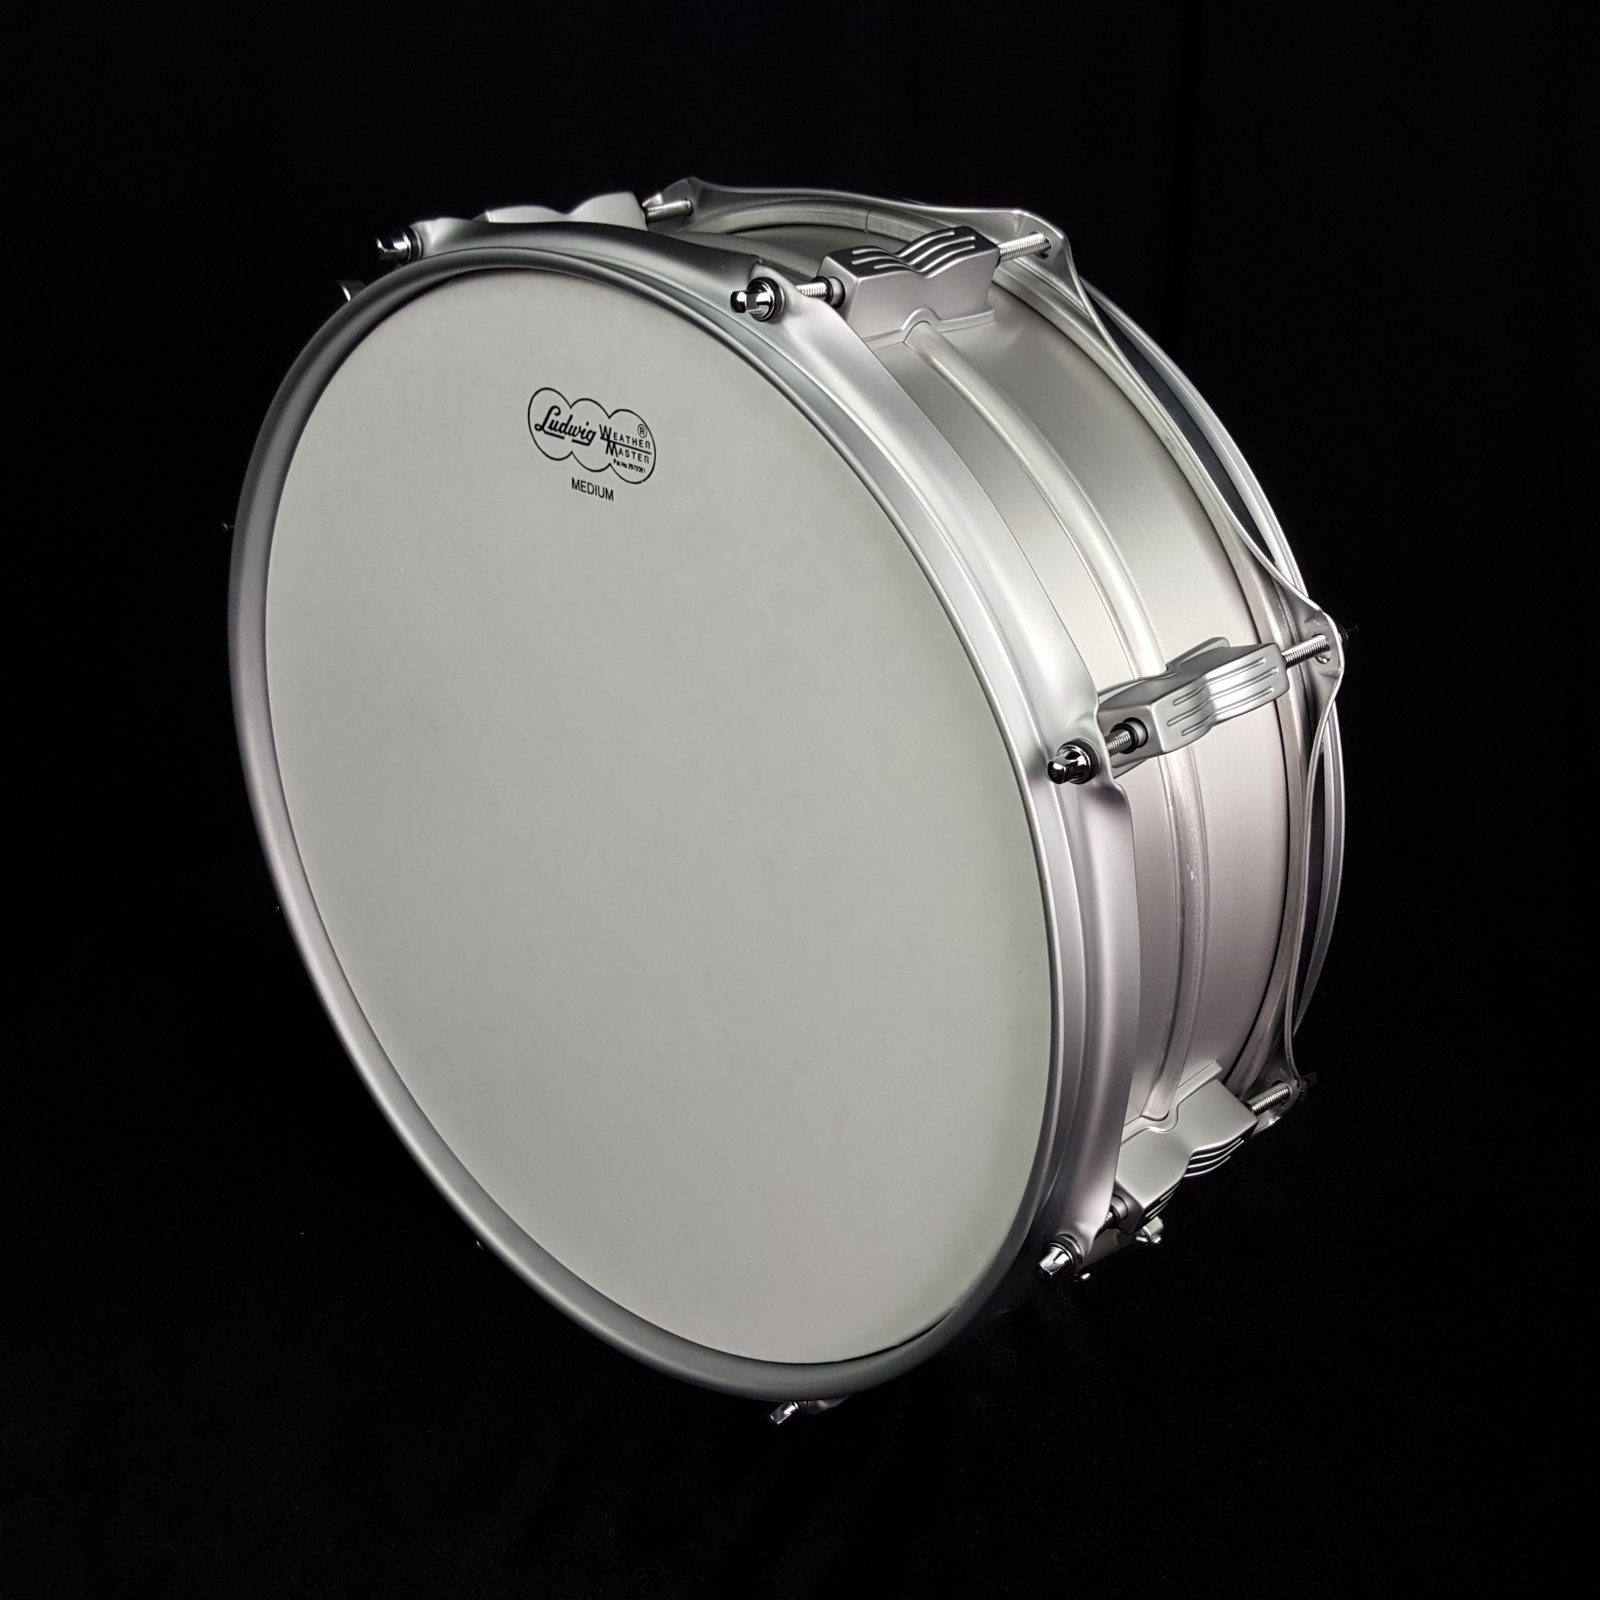 Ludwig LM404LTD  Acrolite Classic Snare Drum 5x14 Brushed Aluminum